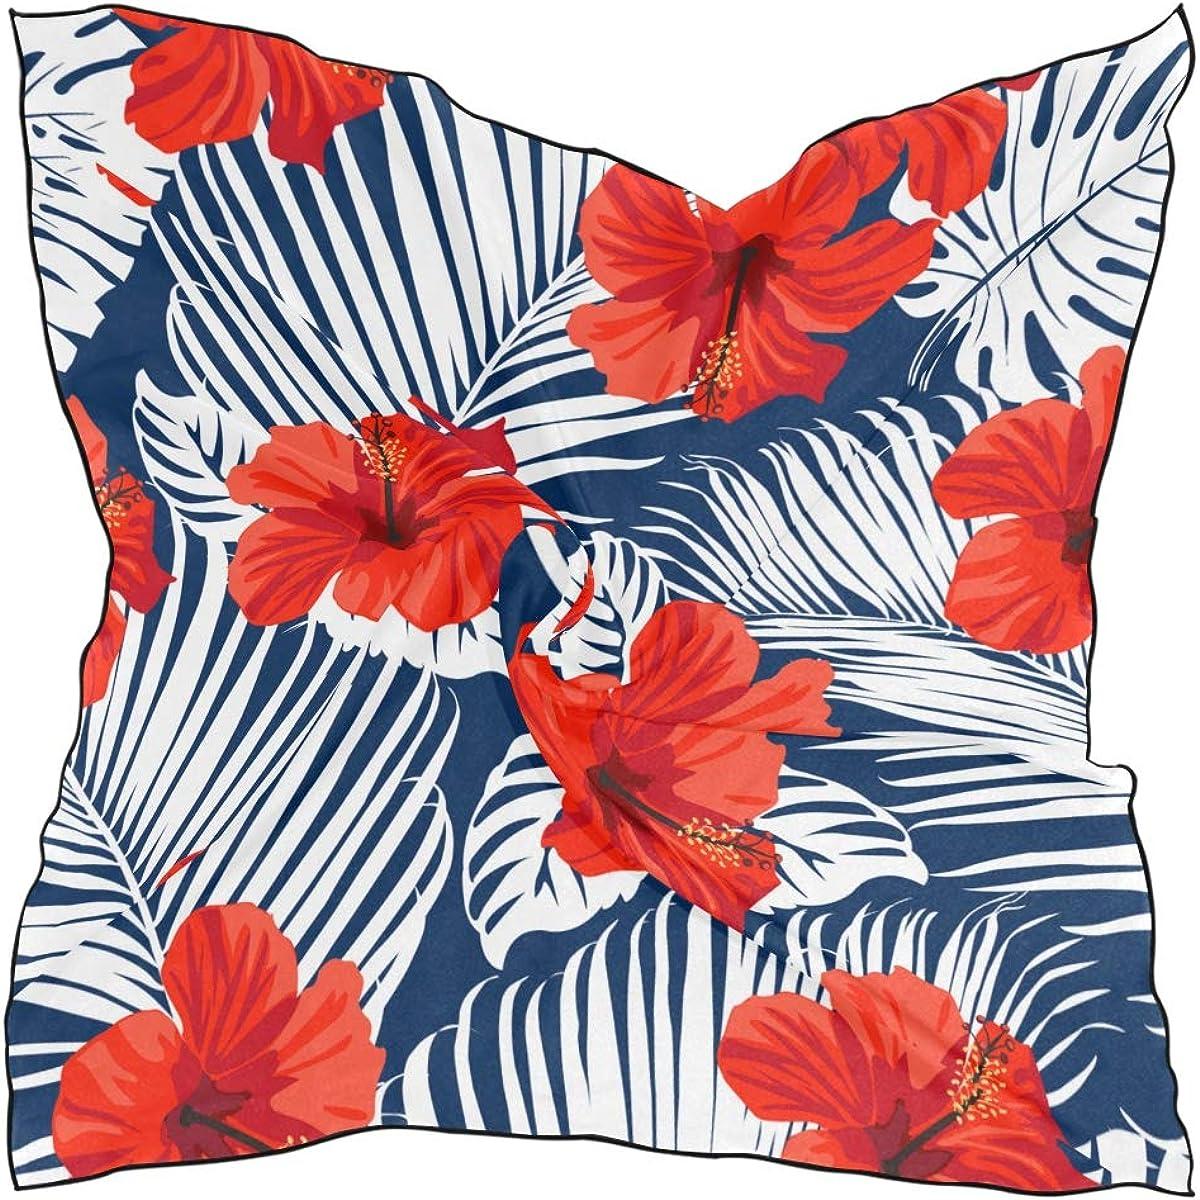 Women's Soft Polyester Silk Square Scarf Hawaiian Flower Vintage Romantic Summer Fashion Print Head & Hair Scarf Neckerchief Accessory-23.6x23.6 Inch